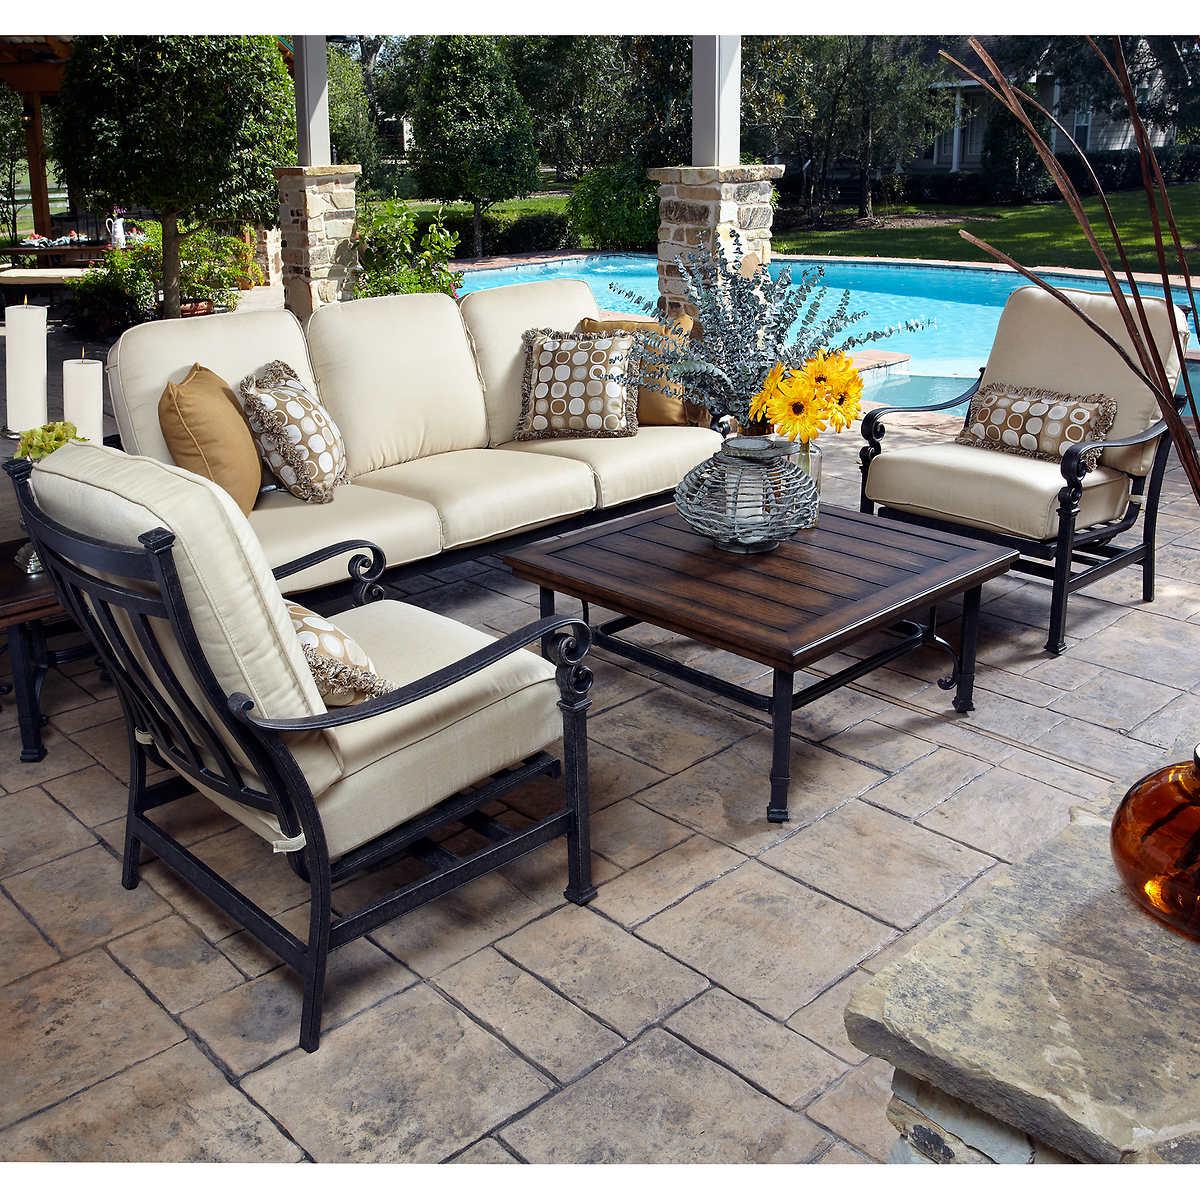 Meridian 5-piece Seating Set - Top Selling Patio